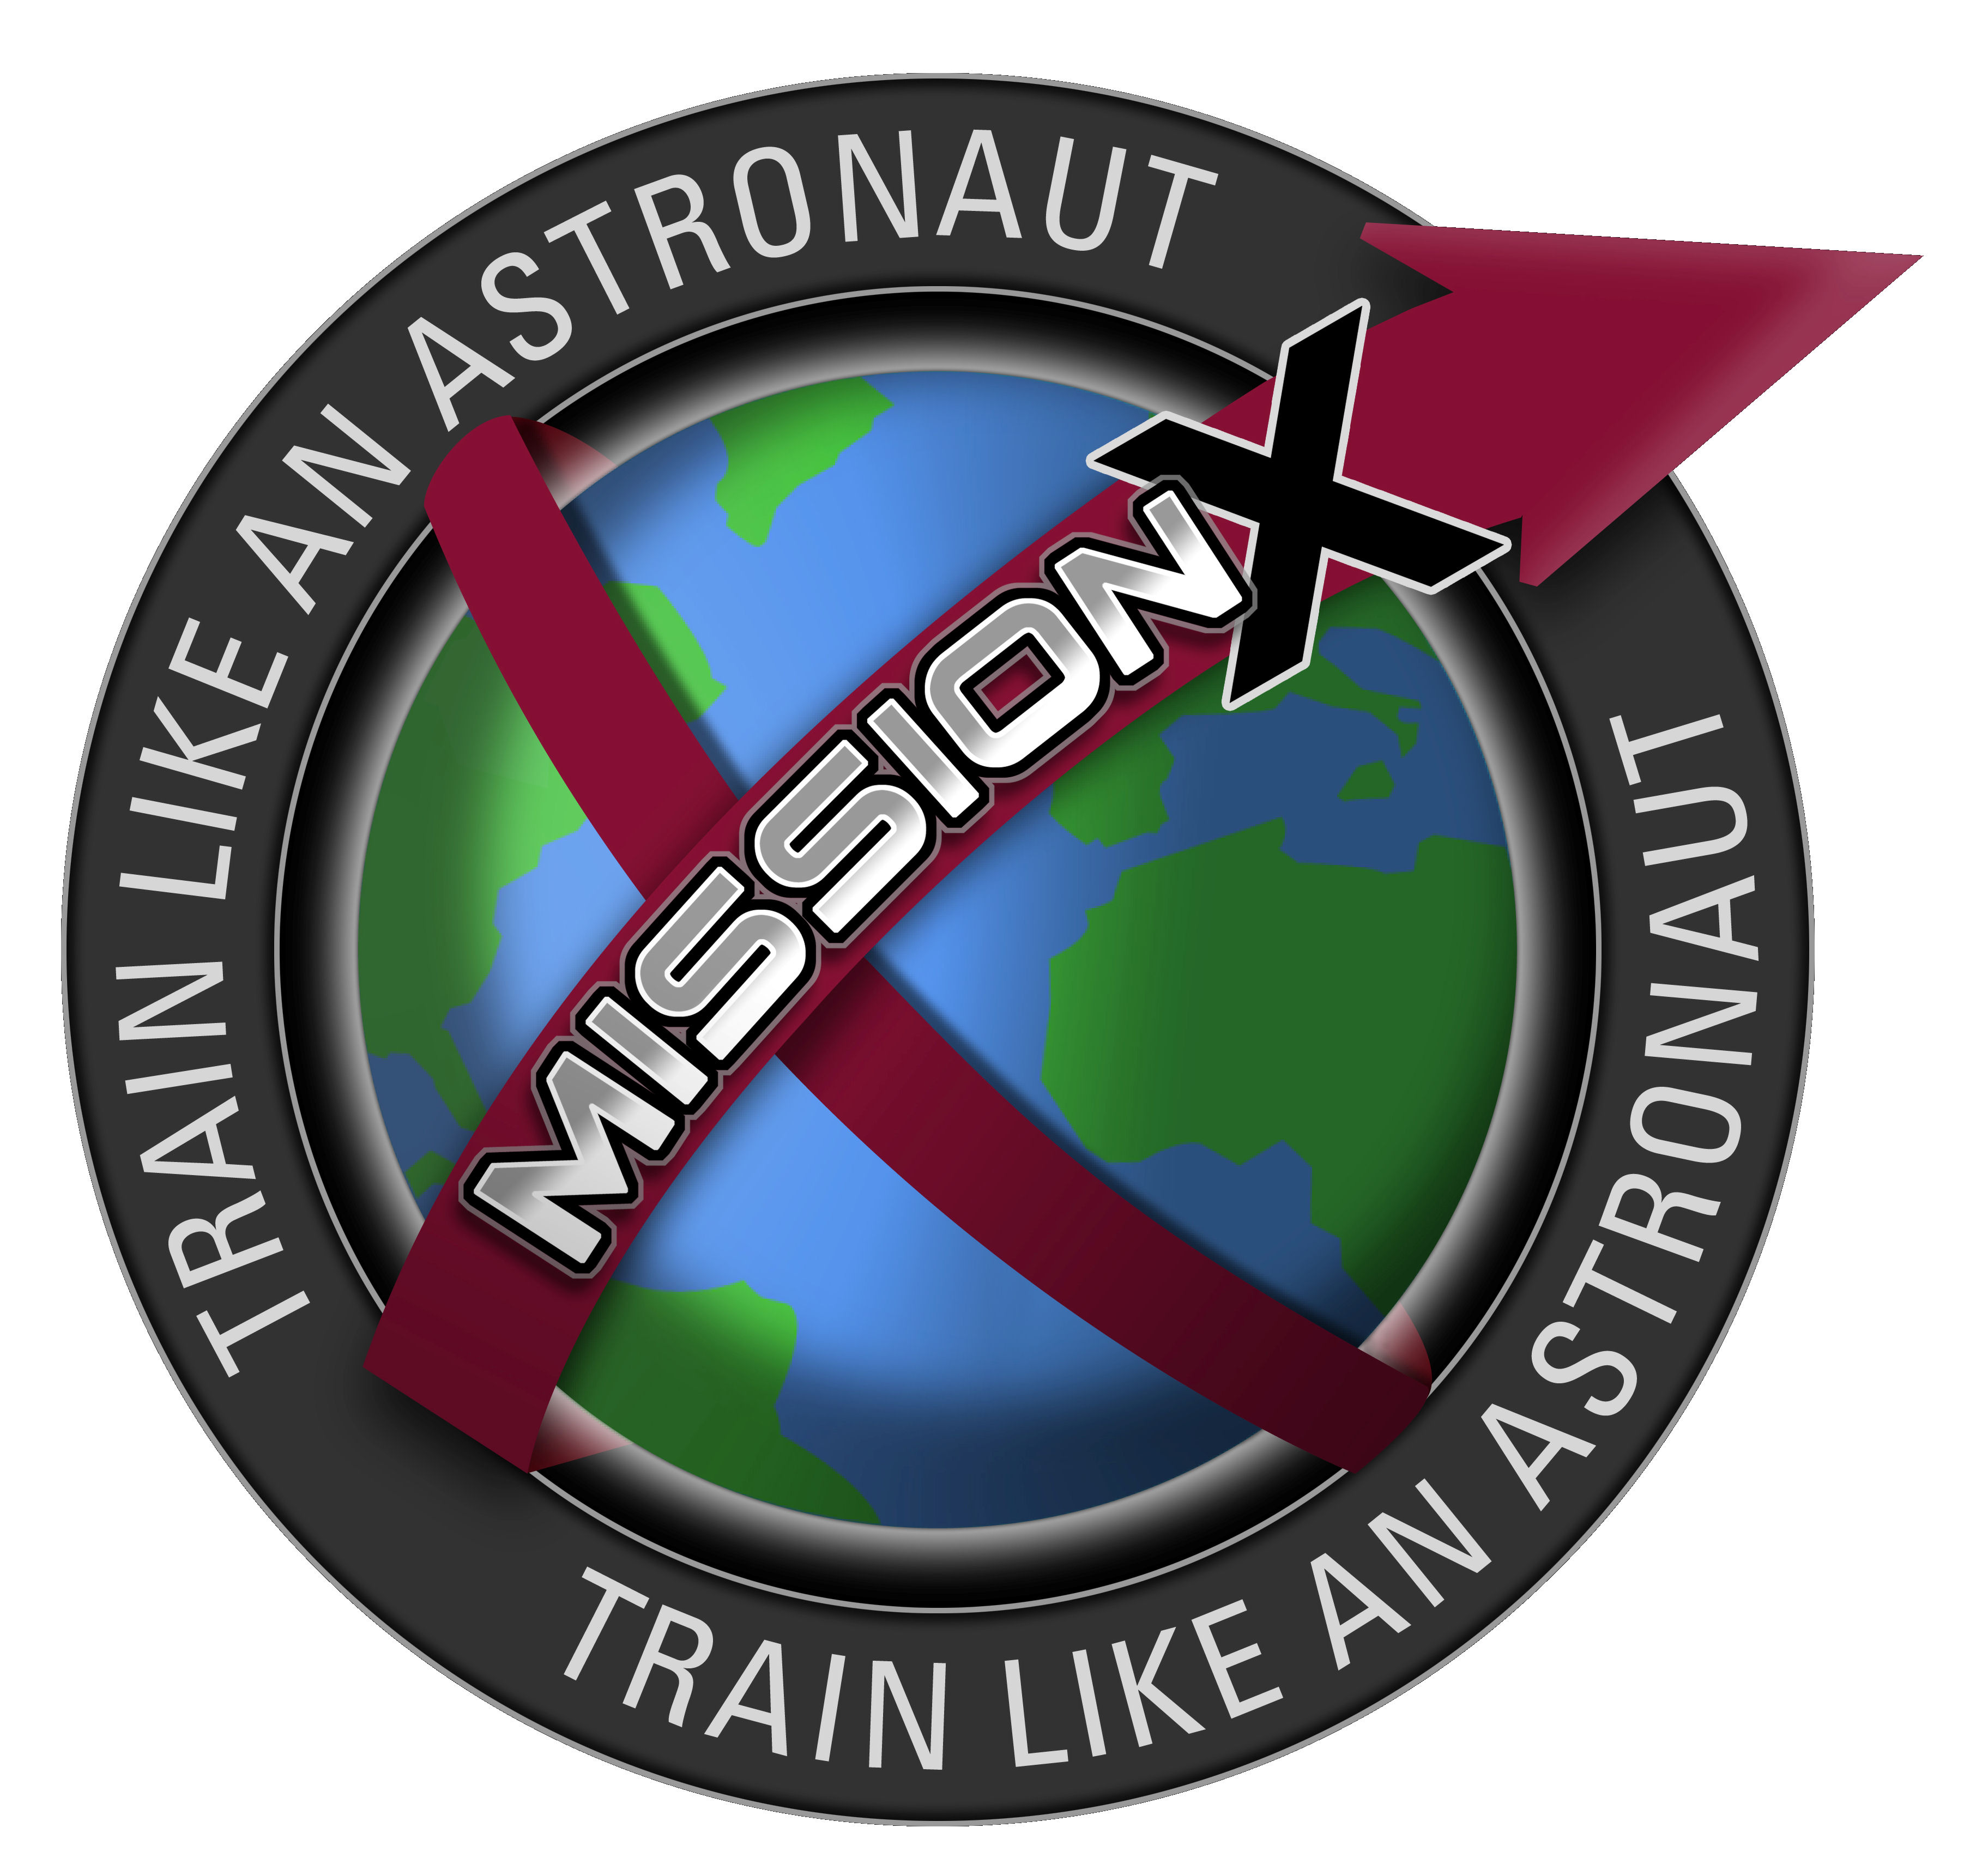 astronaut corps logo - photo #39